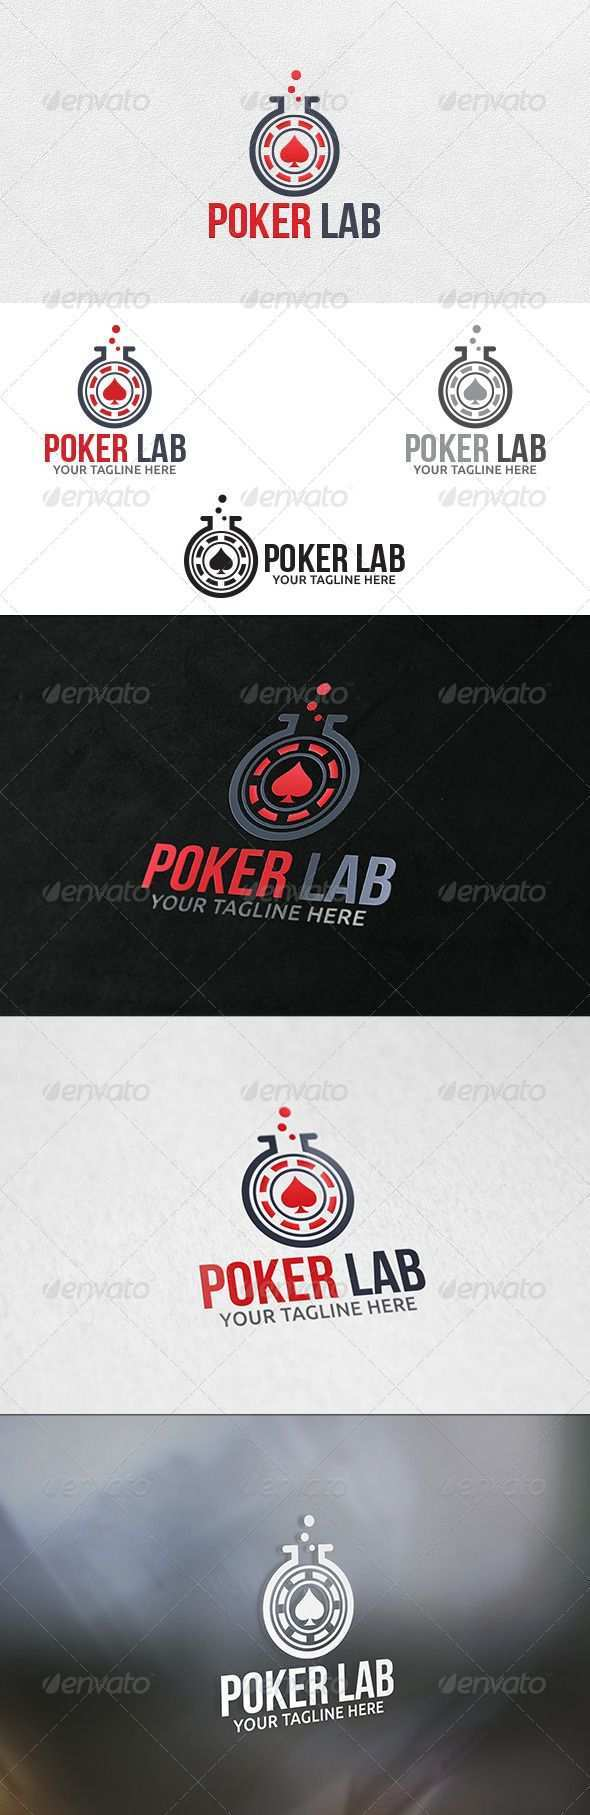 Poker Lab Logo Template Logo Design Vorlage